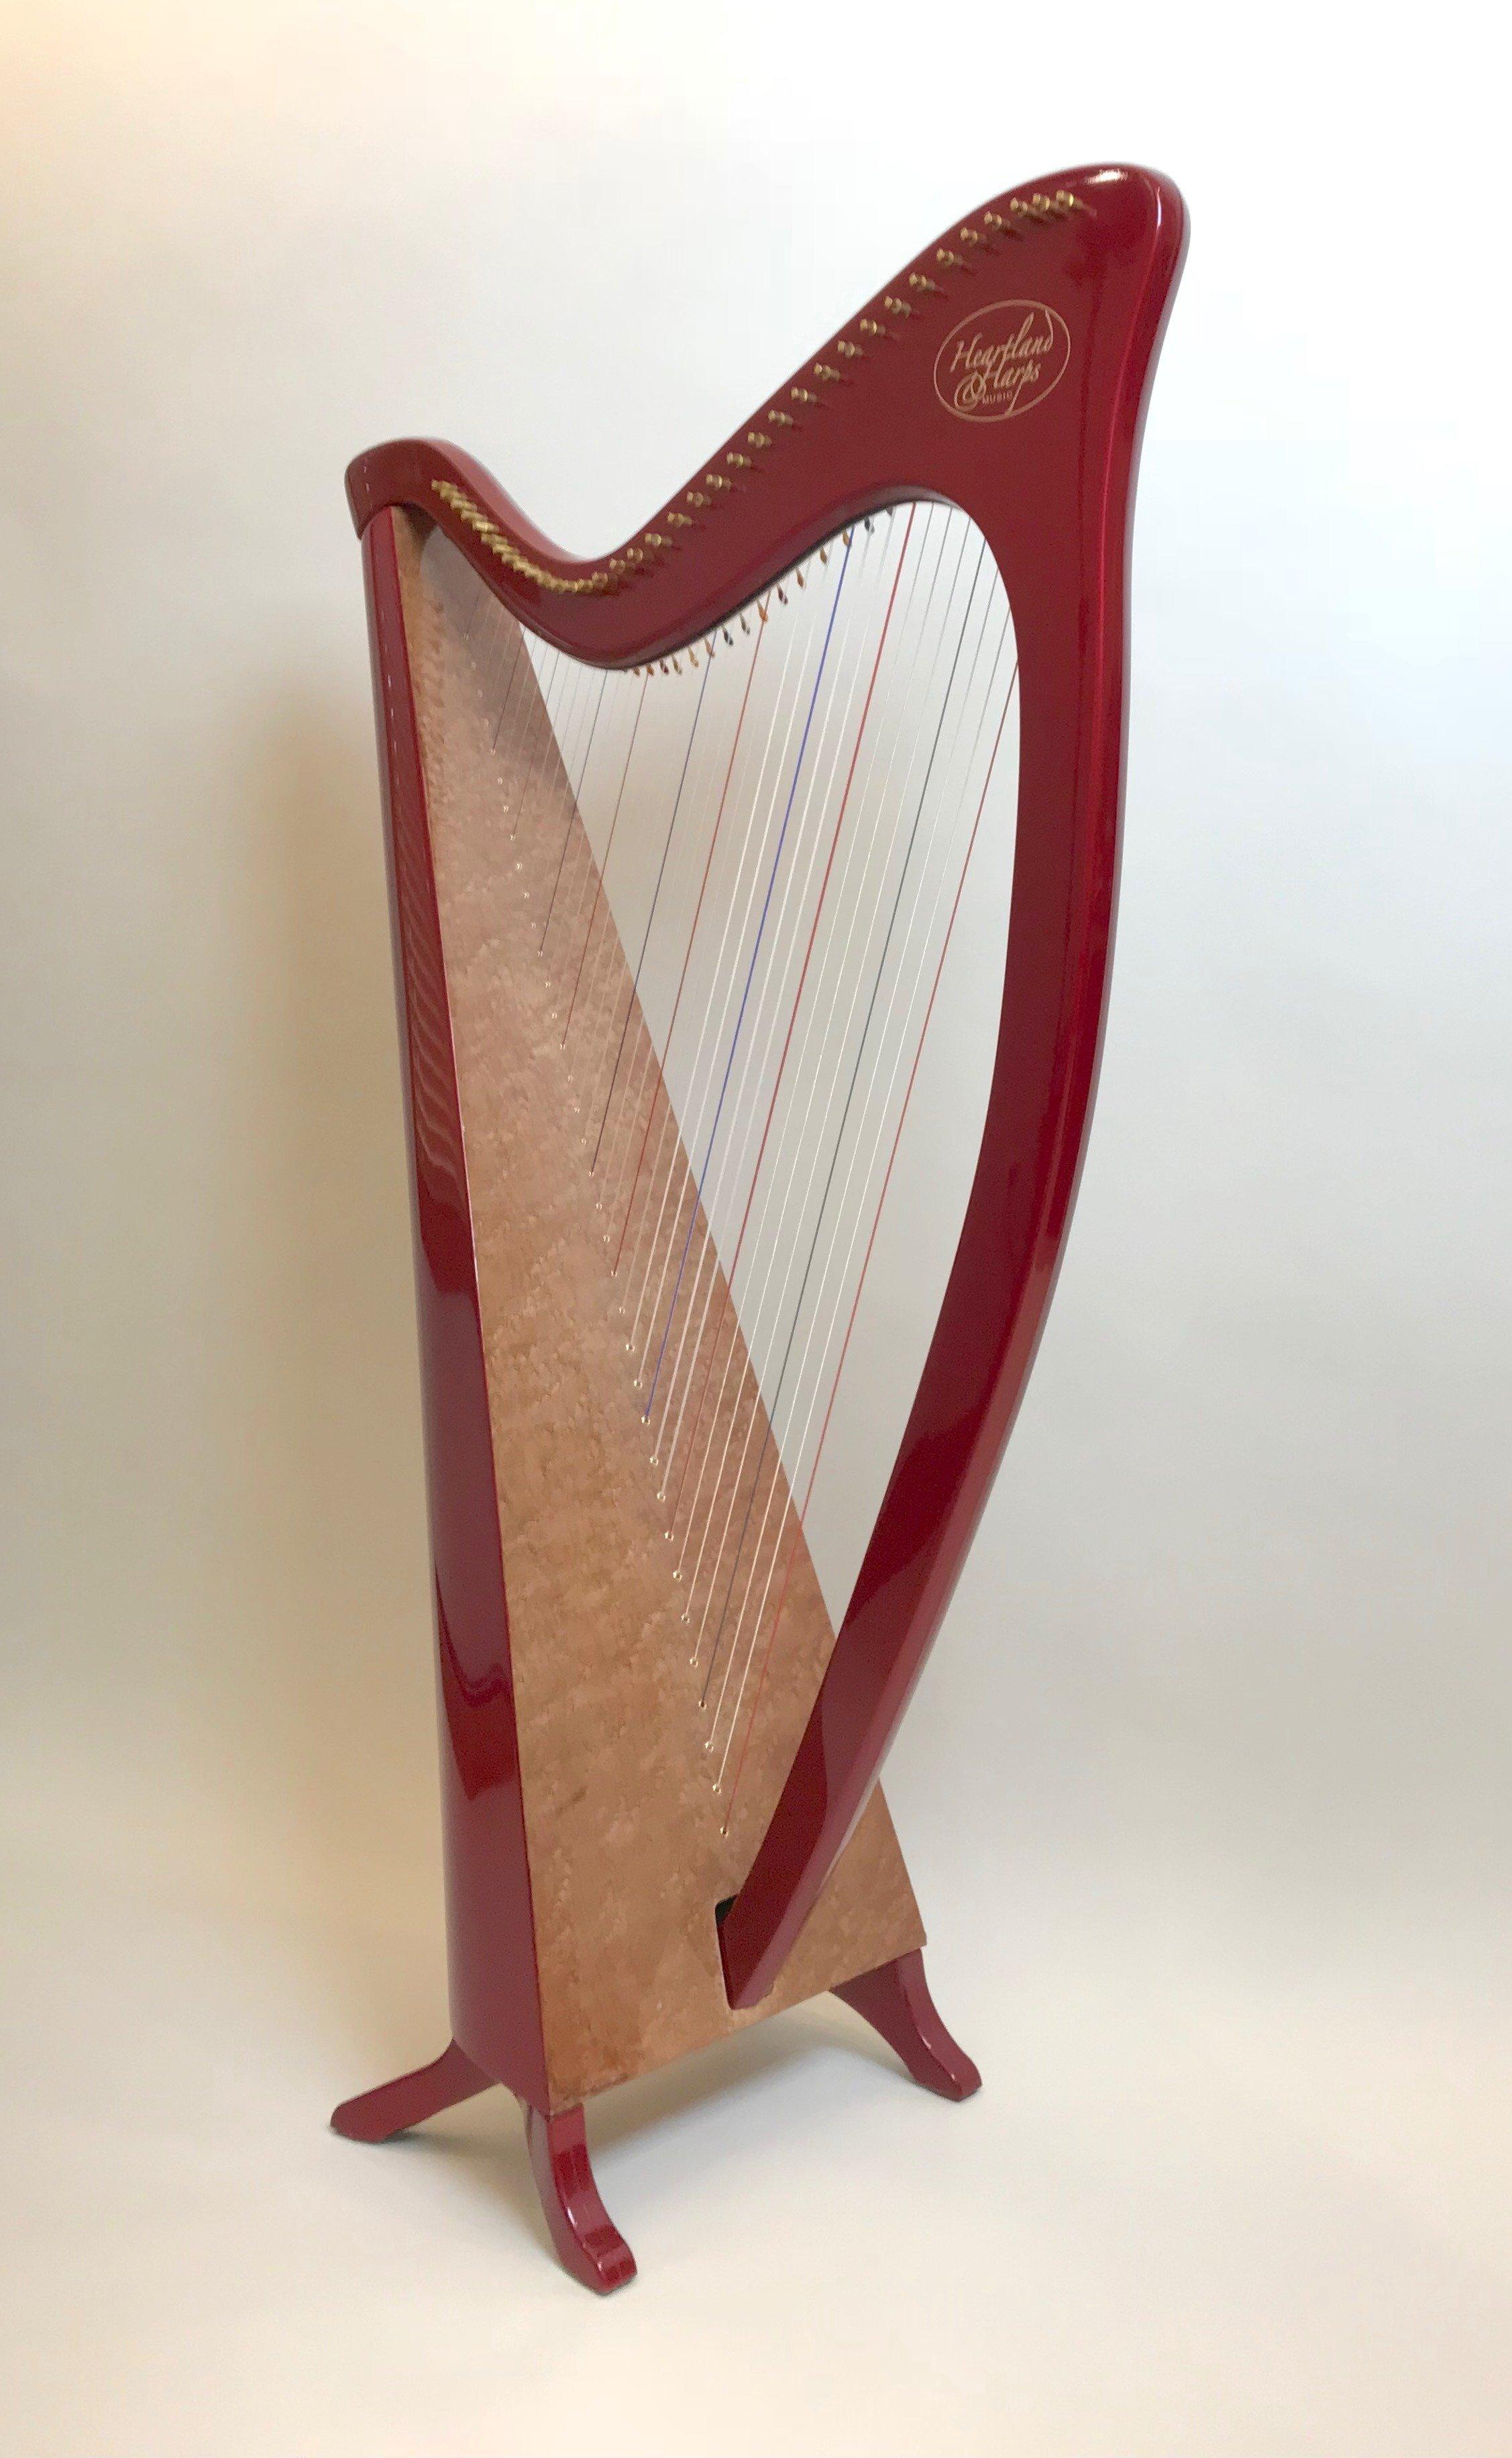 Painted Legend harp with birdseye maple soundboard